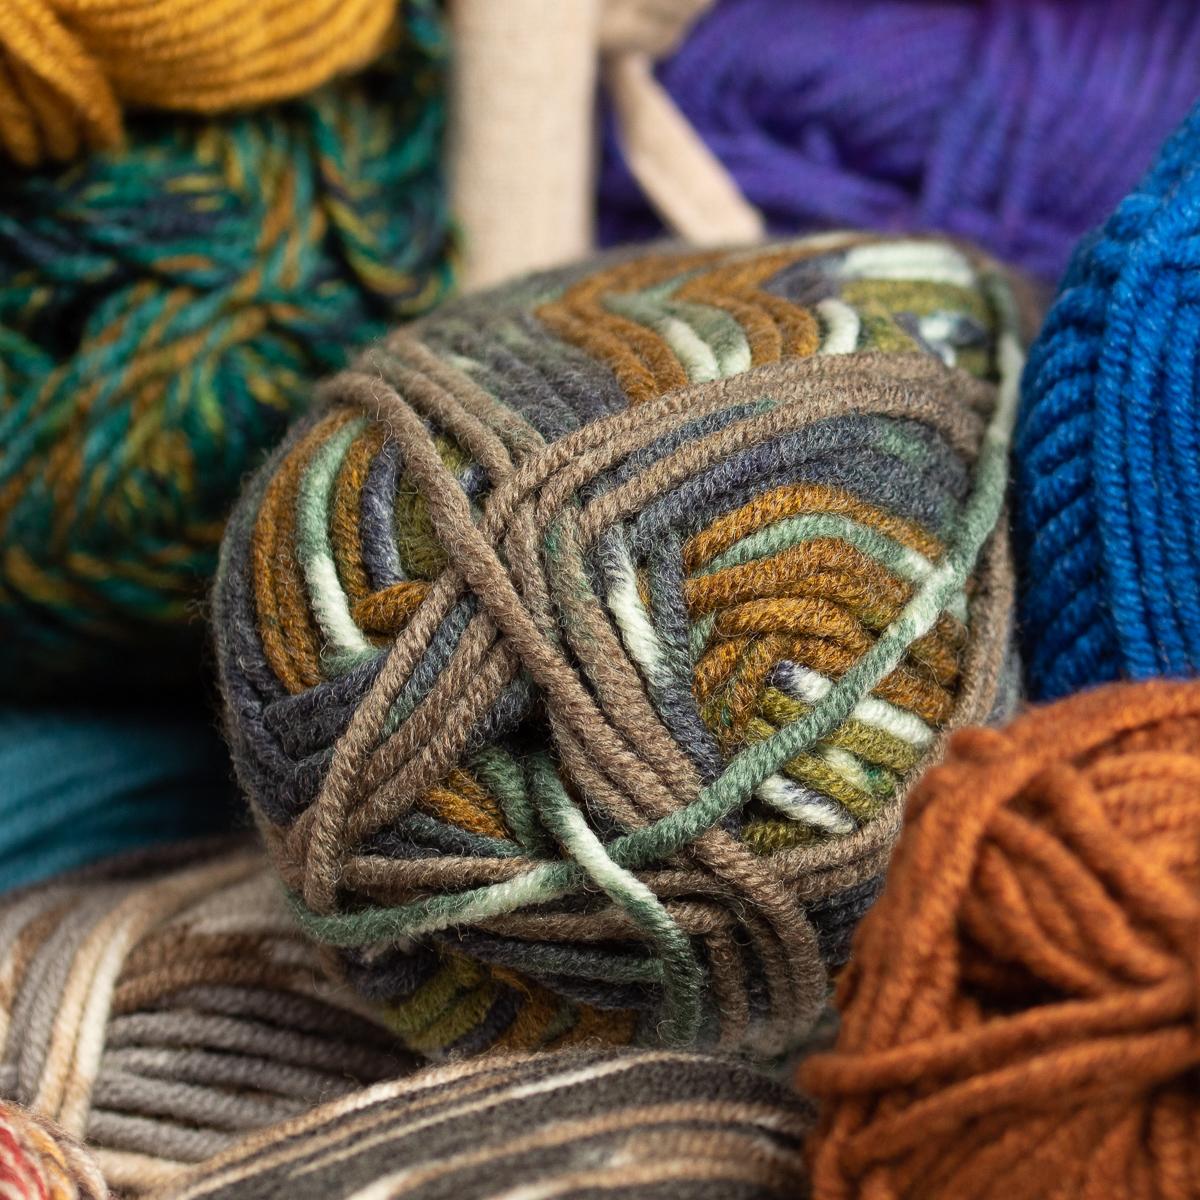 3pk-Lion-Brand-Woolspun-Acrylic-amp-Wool-Yarn-Bulky-5-Knit-Crocheting-Skeins-Soft thumbnail 30